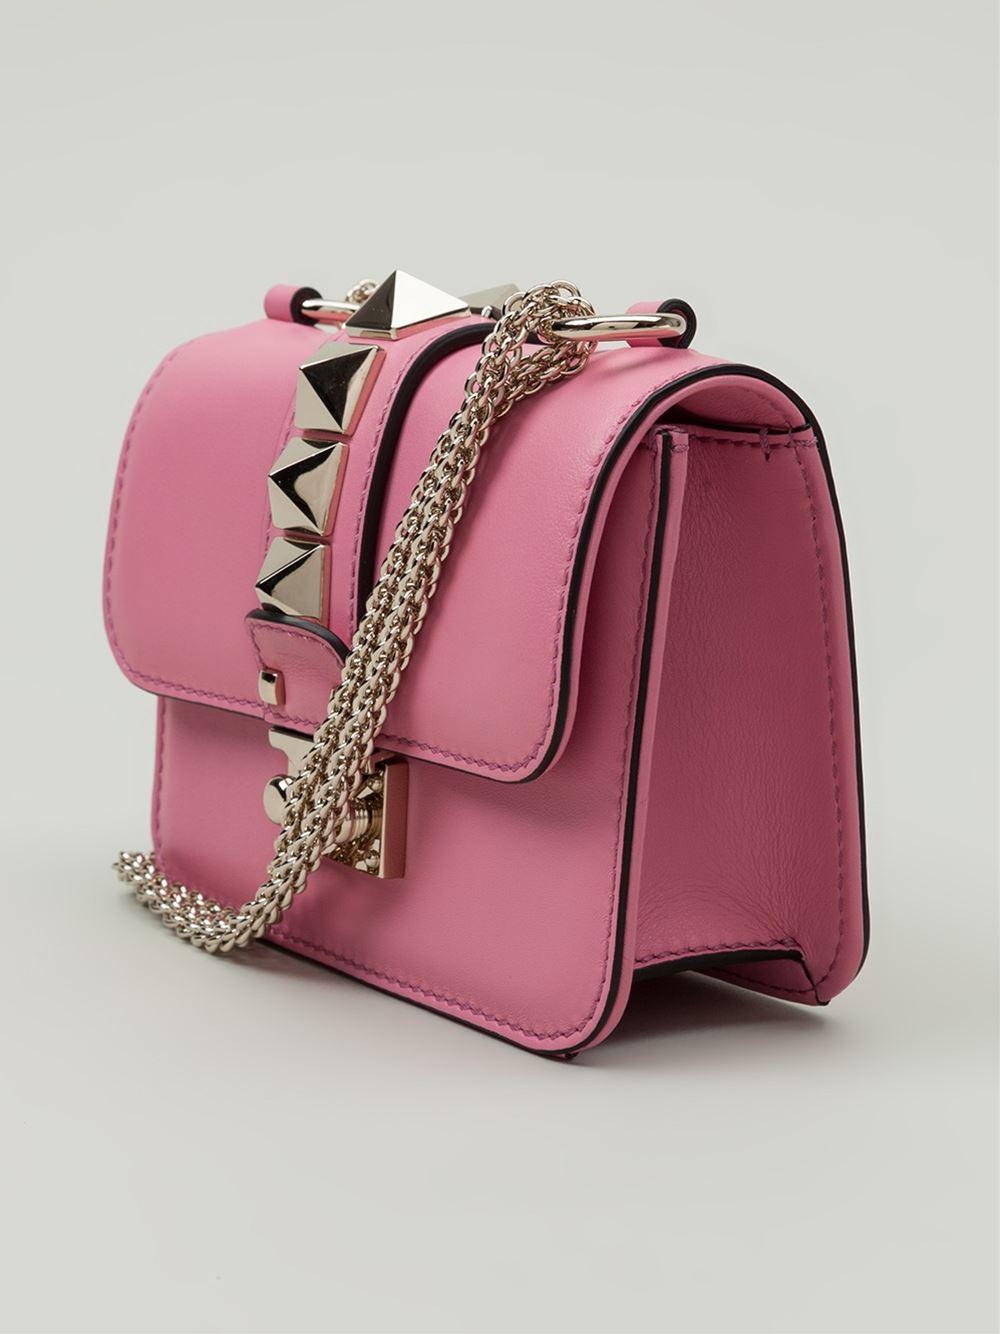 valentino glam lock leather shoulder bag in pink pink